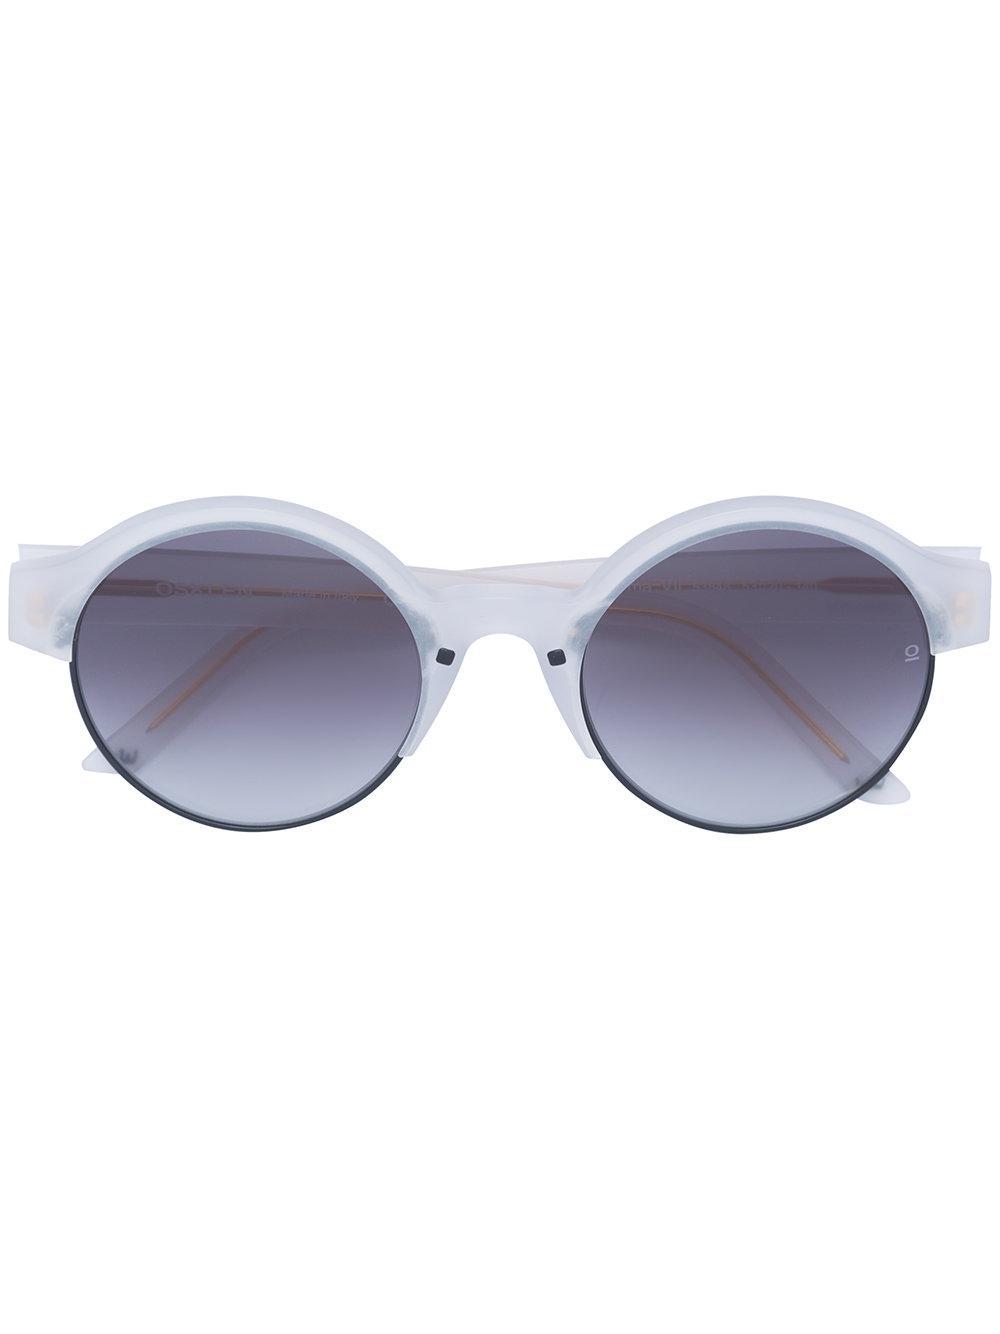 bf52867999 Lyst - Osklen Tarsila Collection Sunglasses in Gray